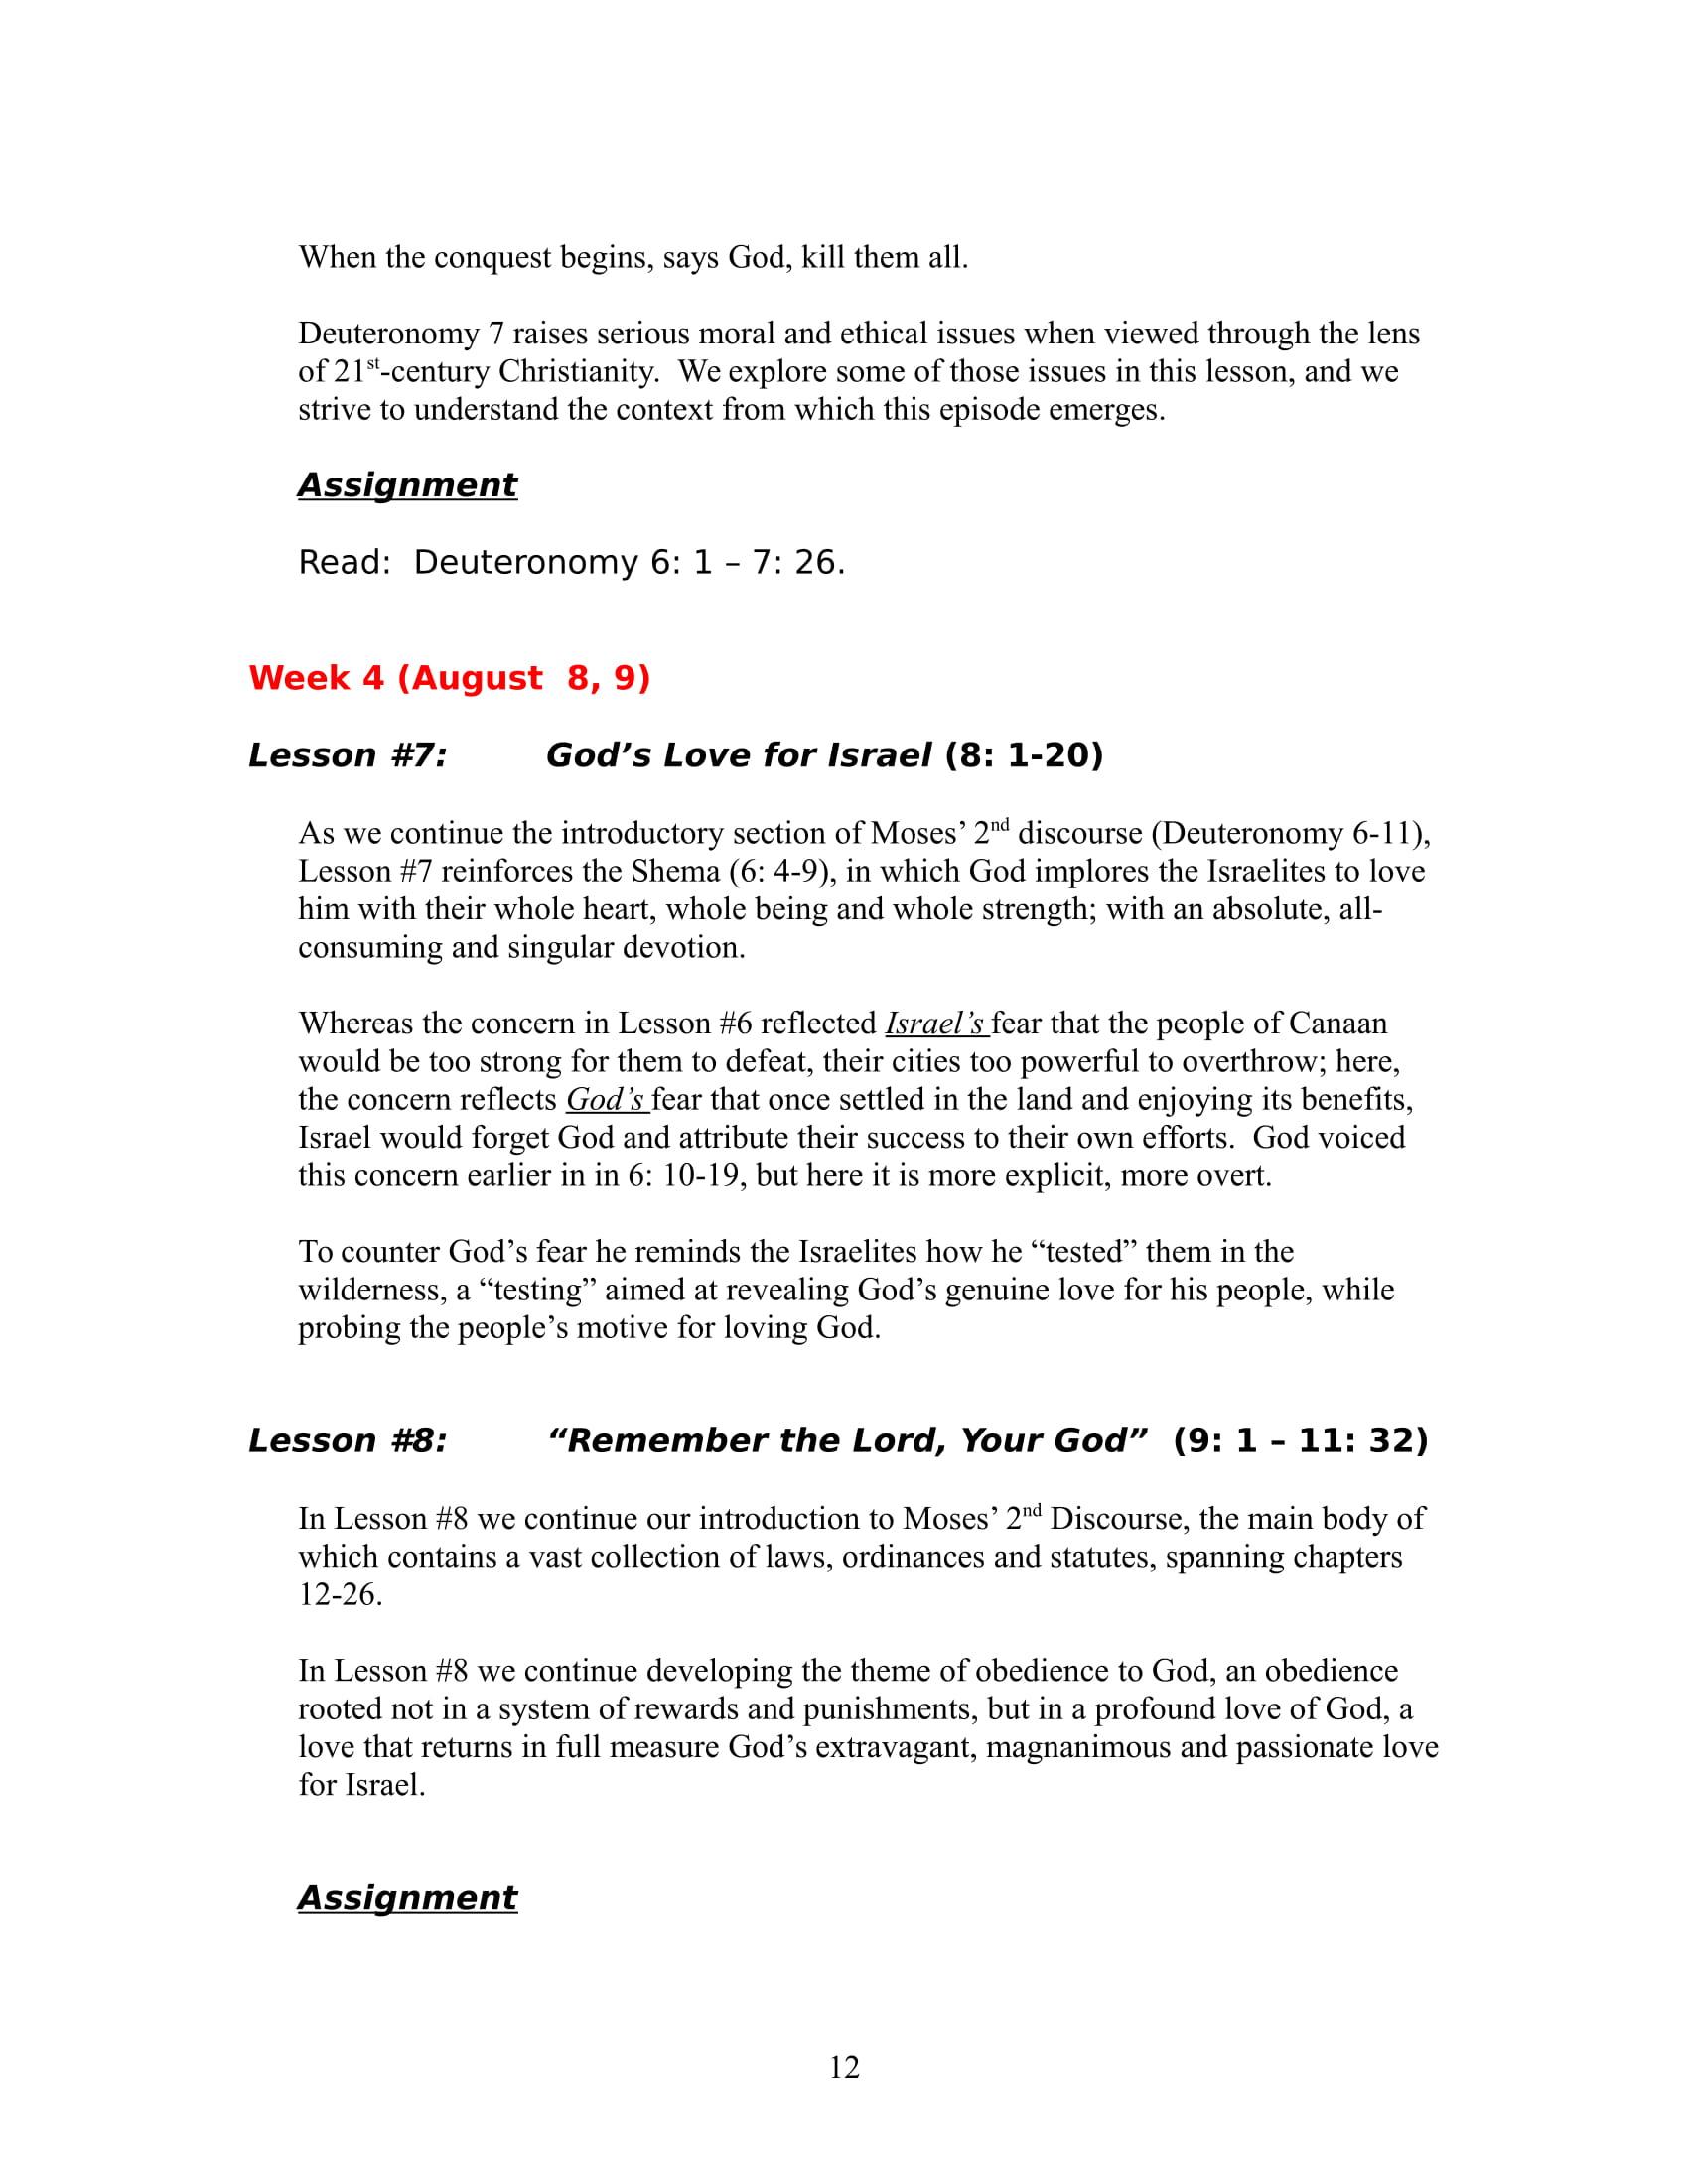 Deuteronomy Syllabus-12.jpg